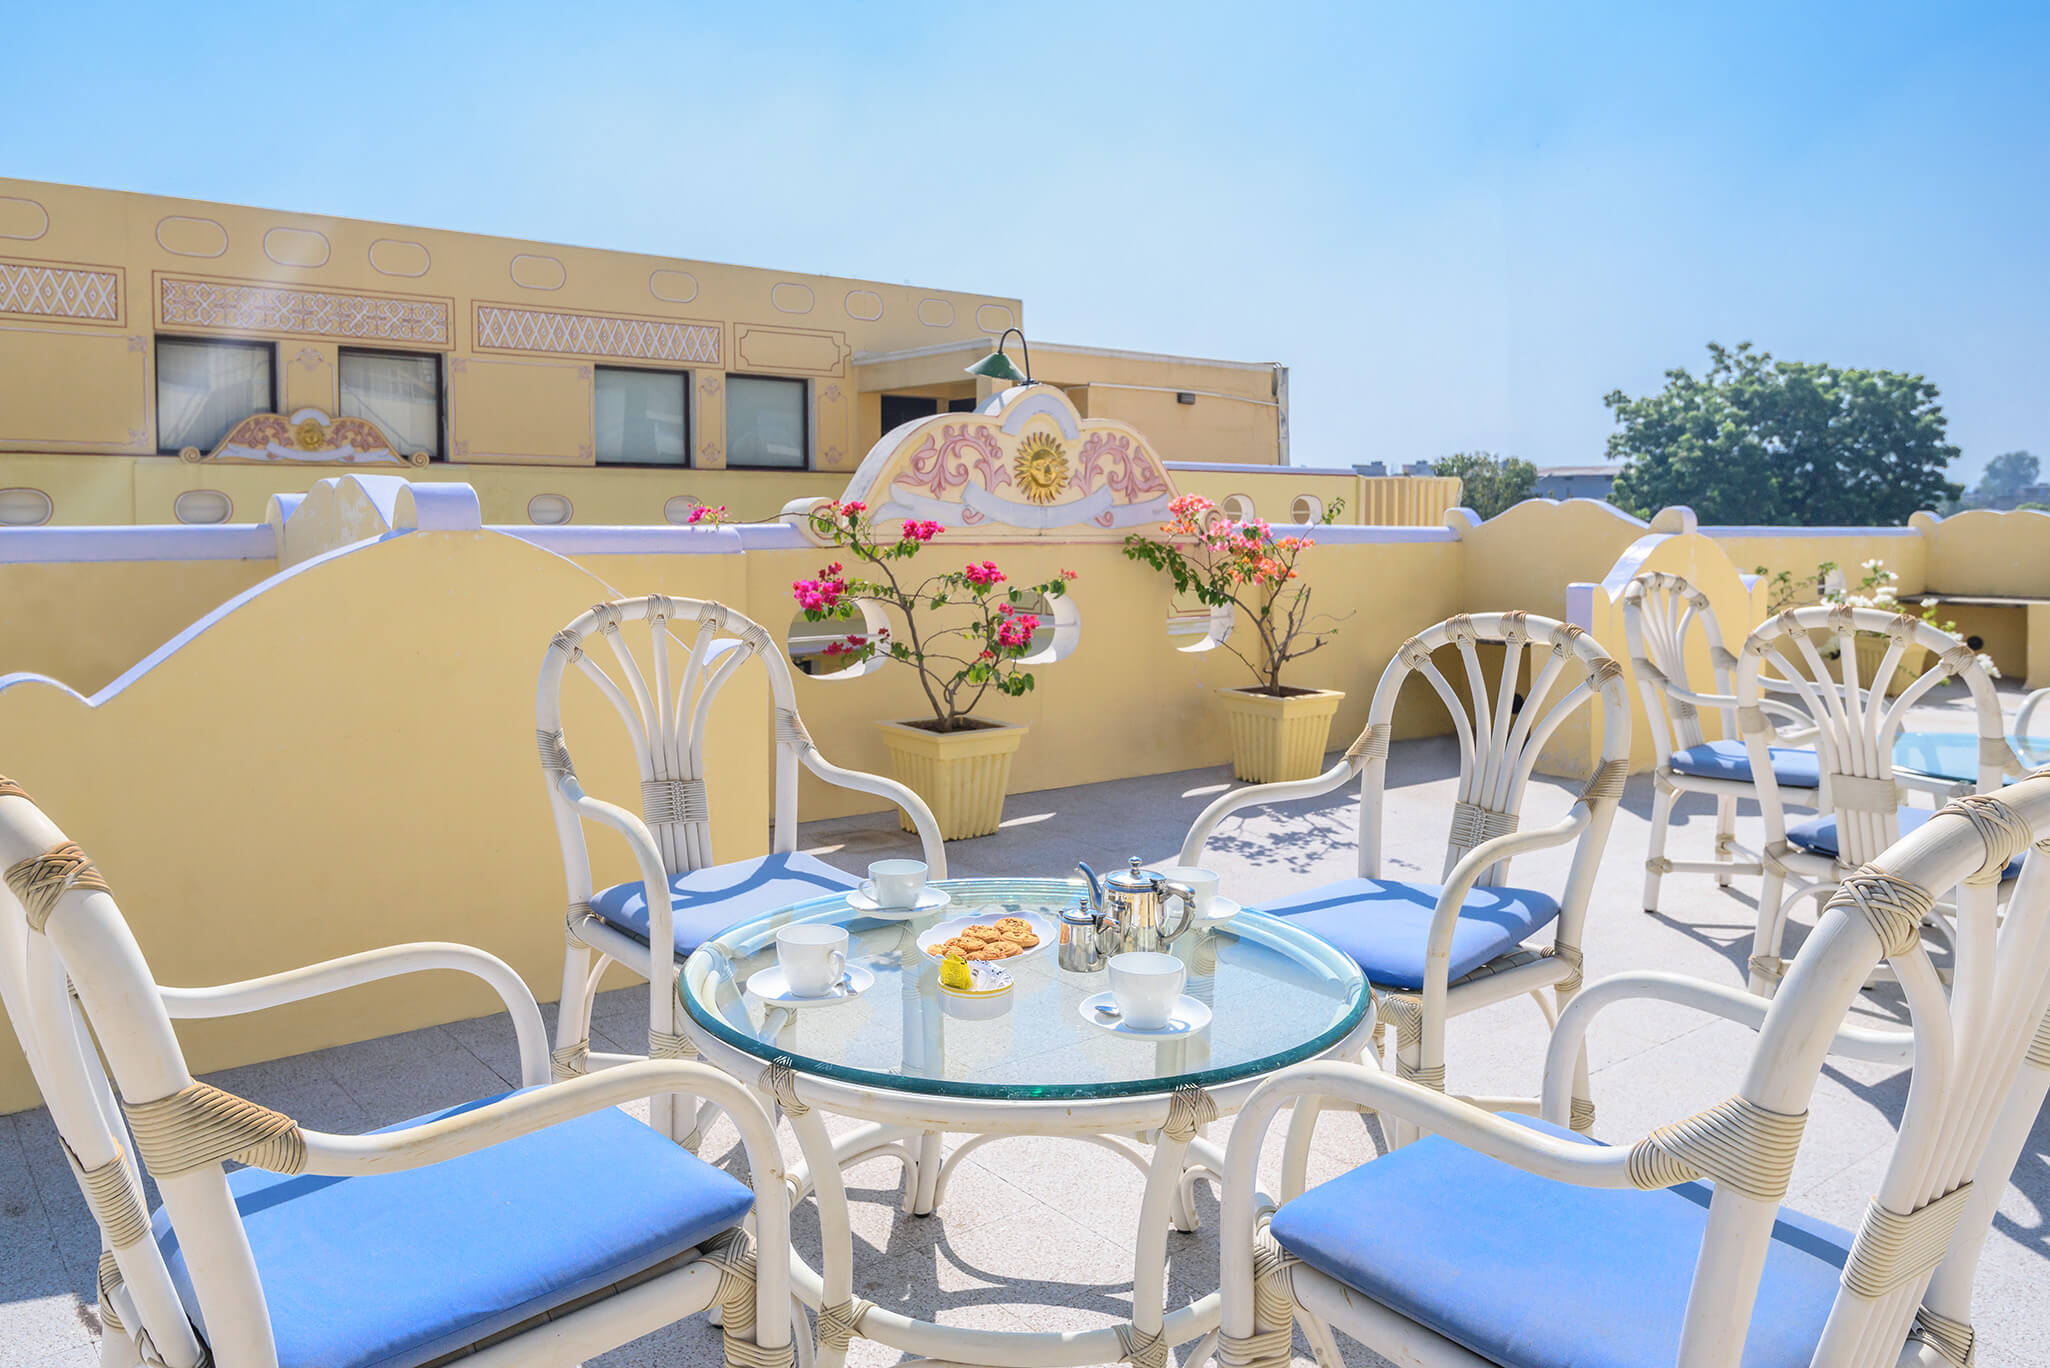 fell gorgeous in luxury hotel of Karma Haveli restaurant